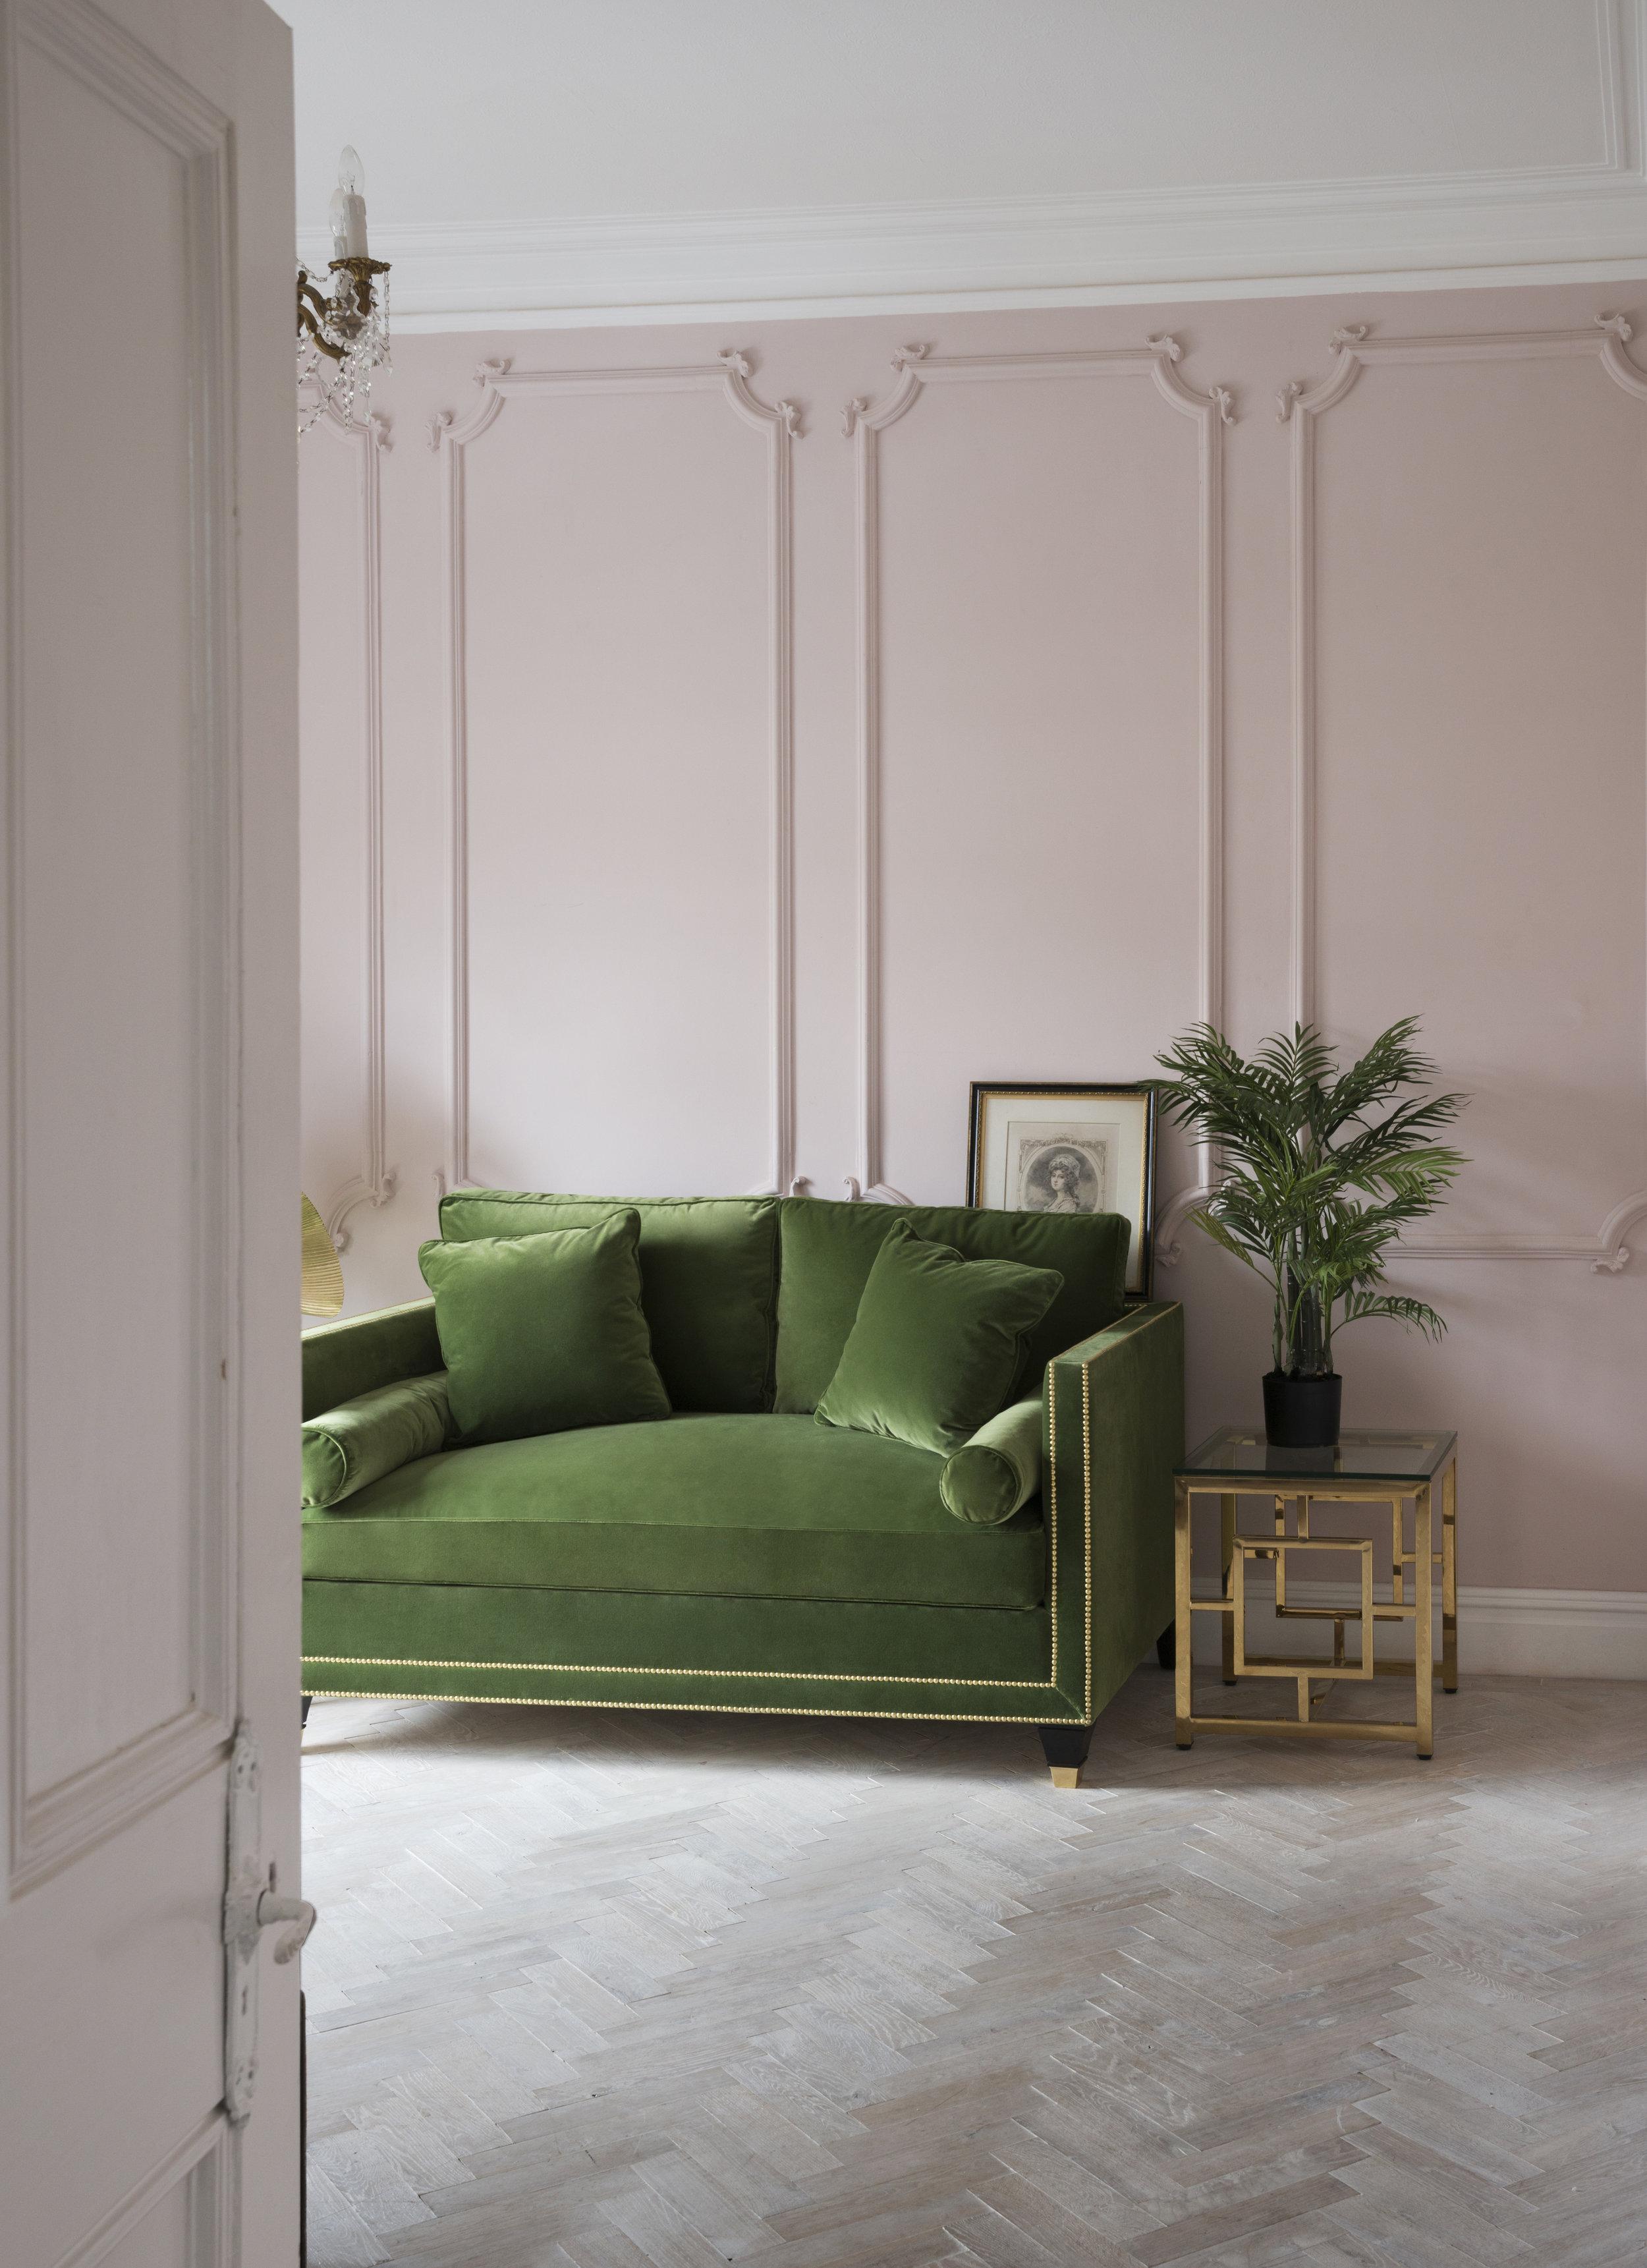 Hatfield Grass Sofa copy.jpg